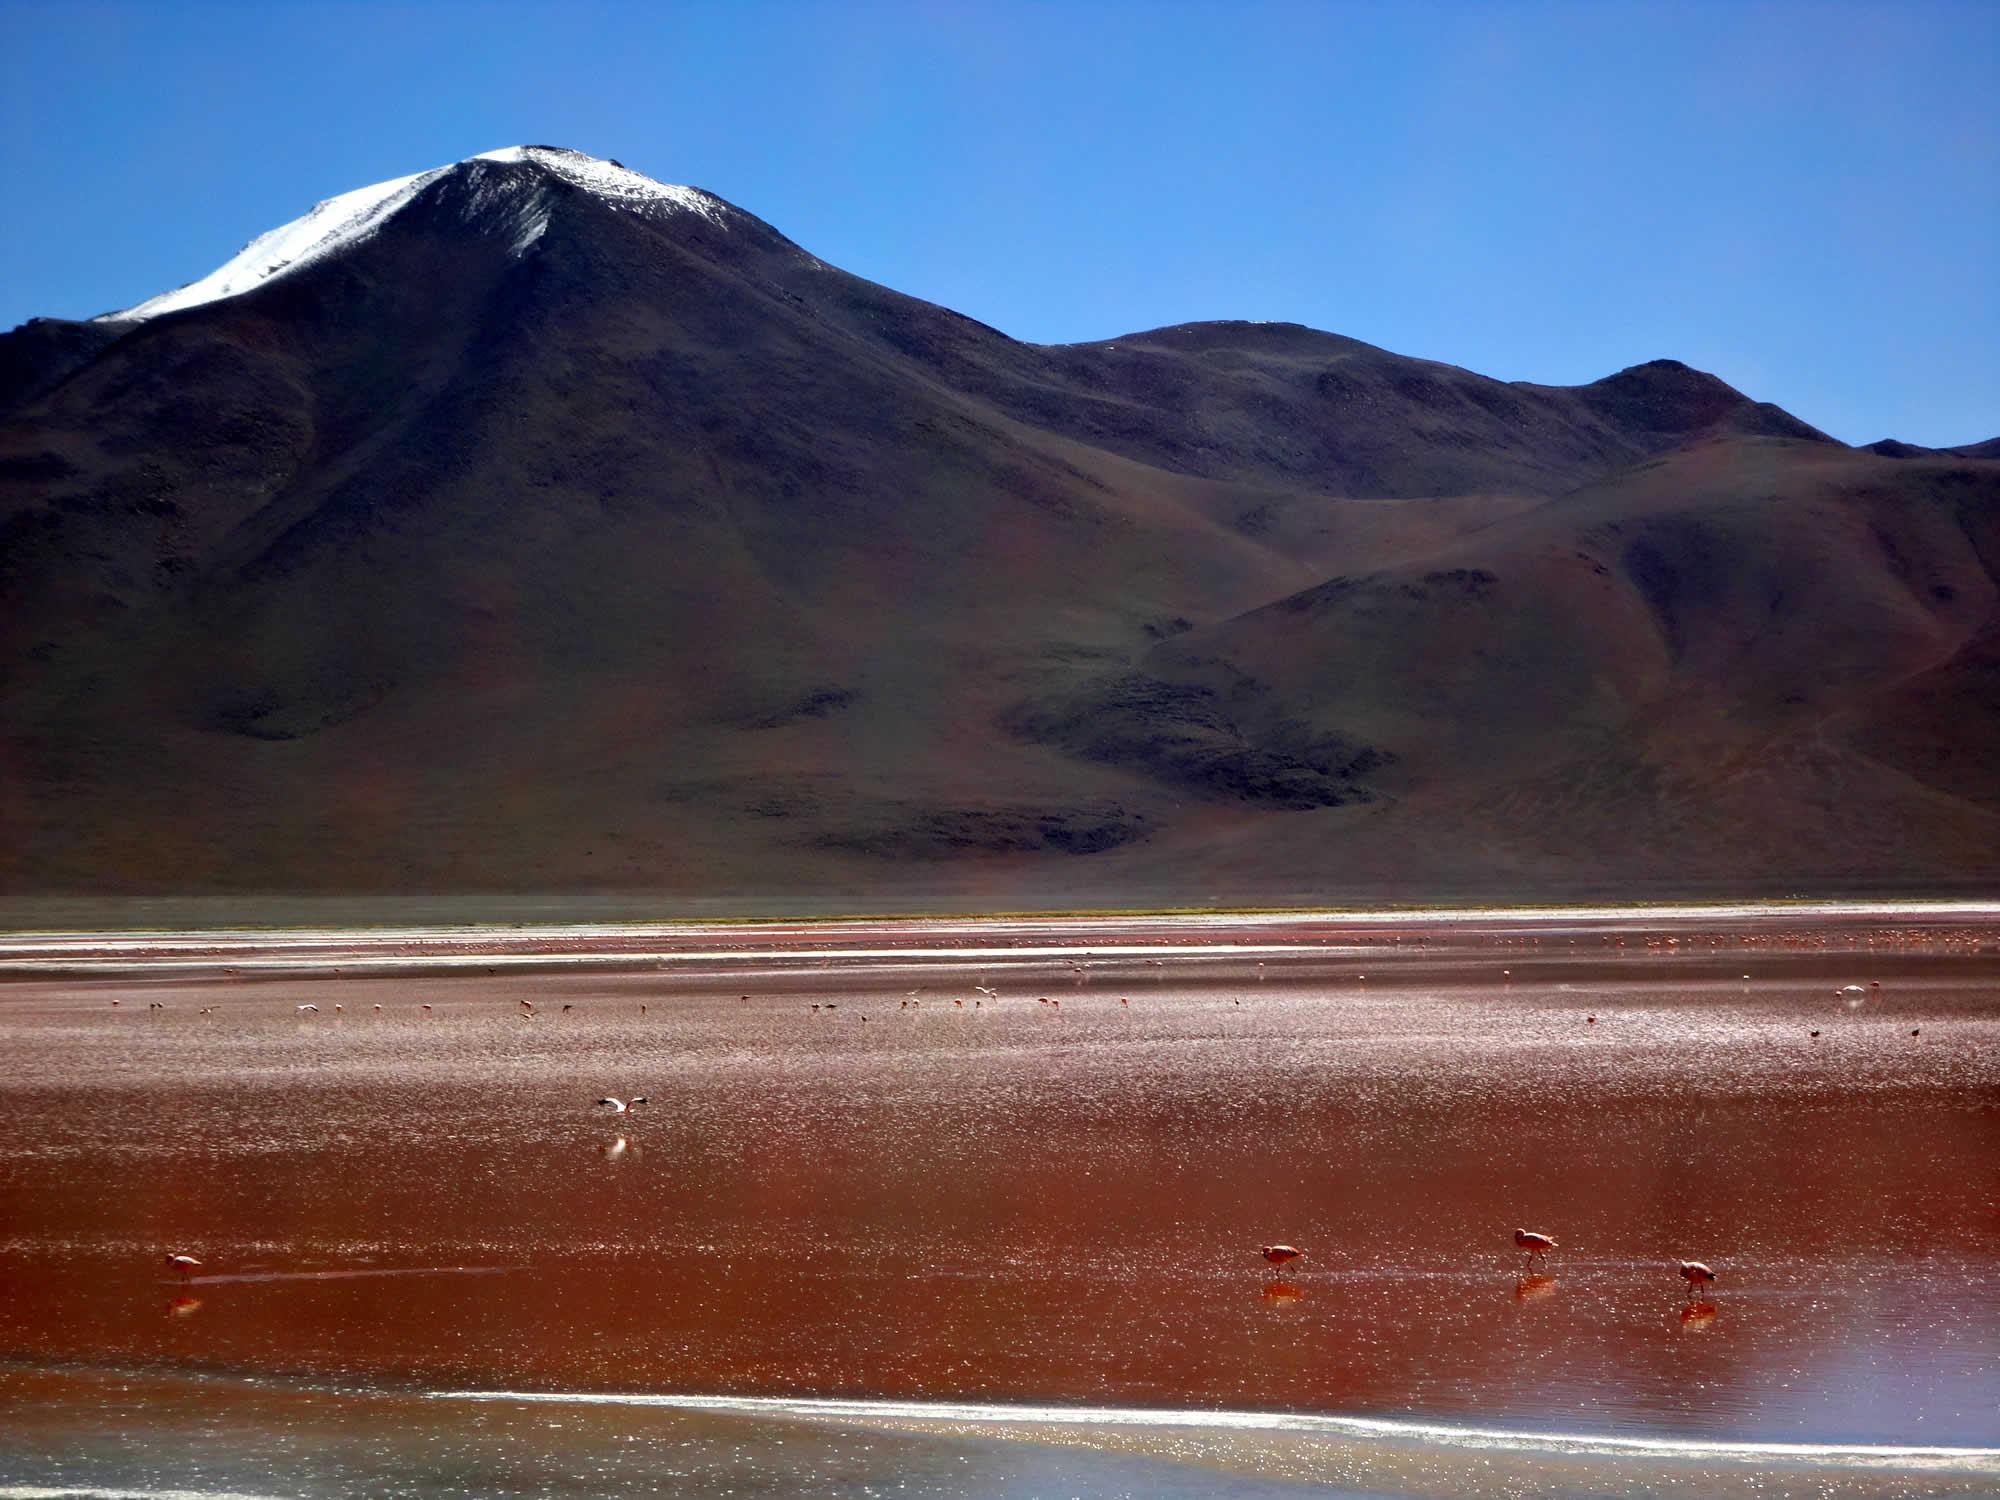 La Paz - Uyuni Salt Flat - La Paz Shared Tour by Train, Uyuni